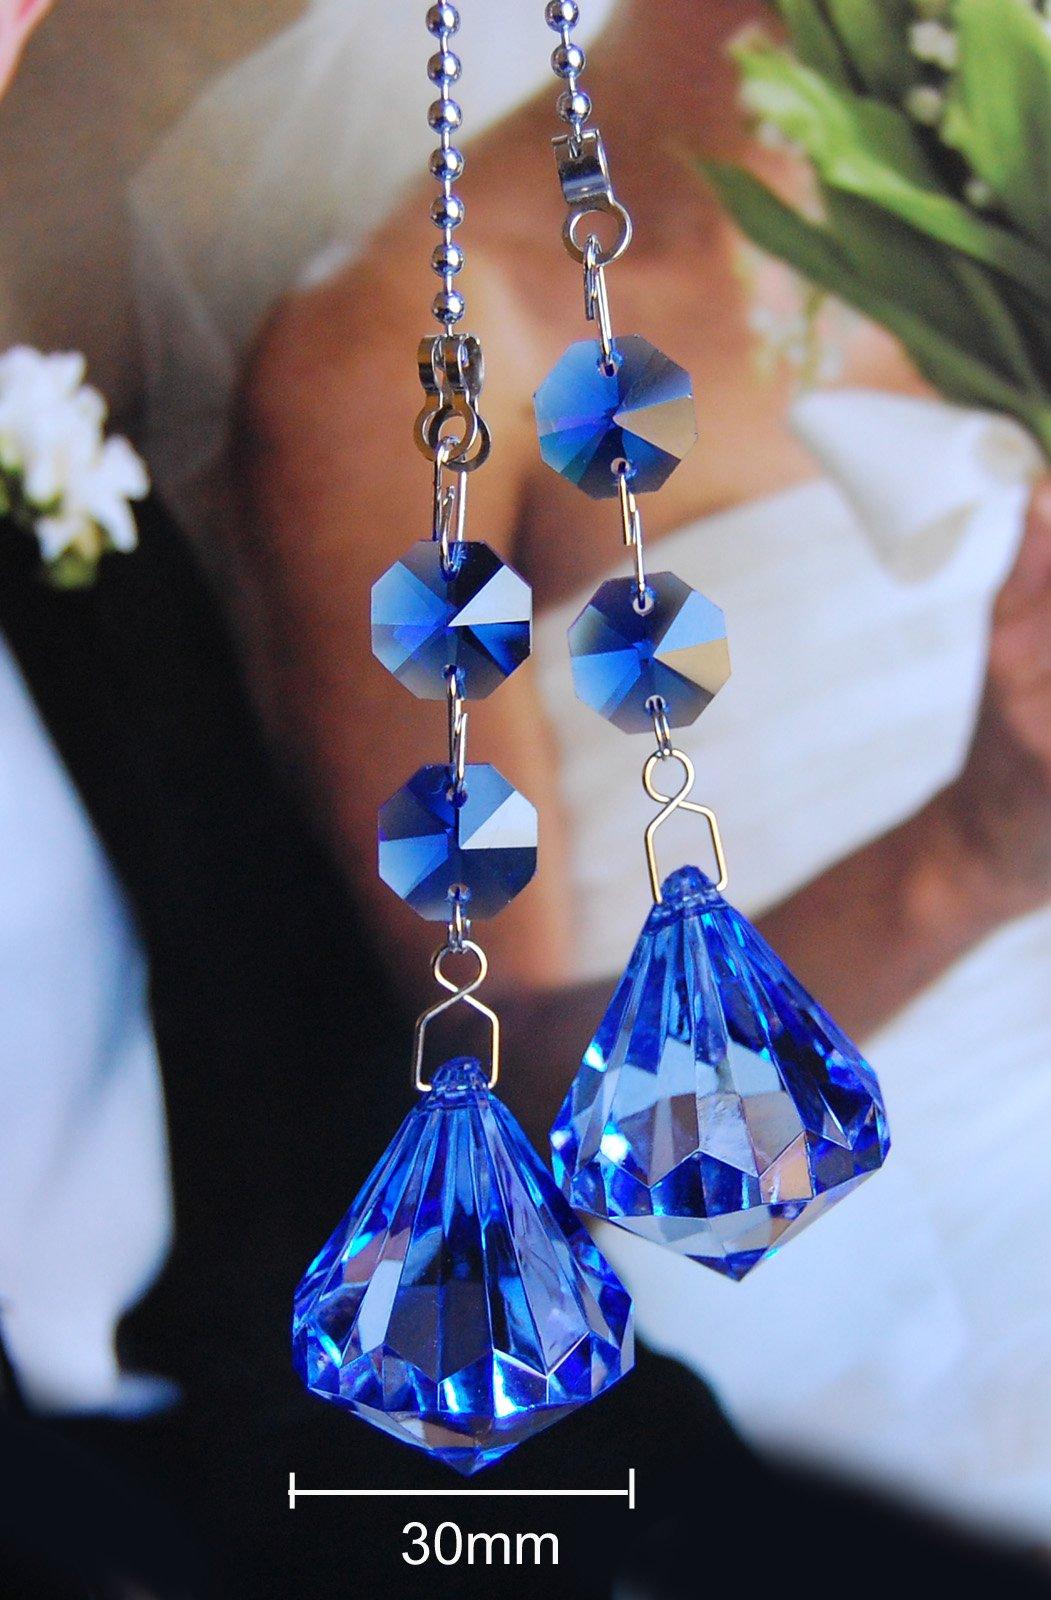 2 of Gorgeous Blue Crystal Diamond Ceiling Lighting Fan Pulls